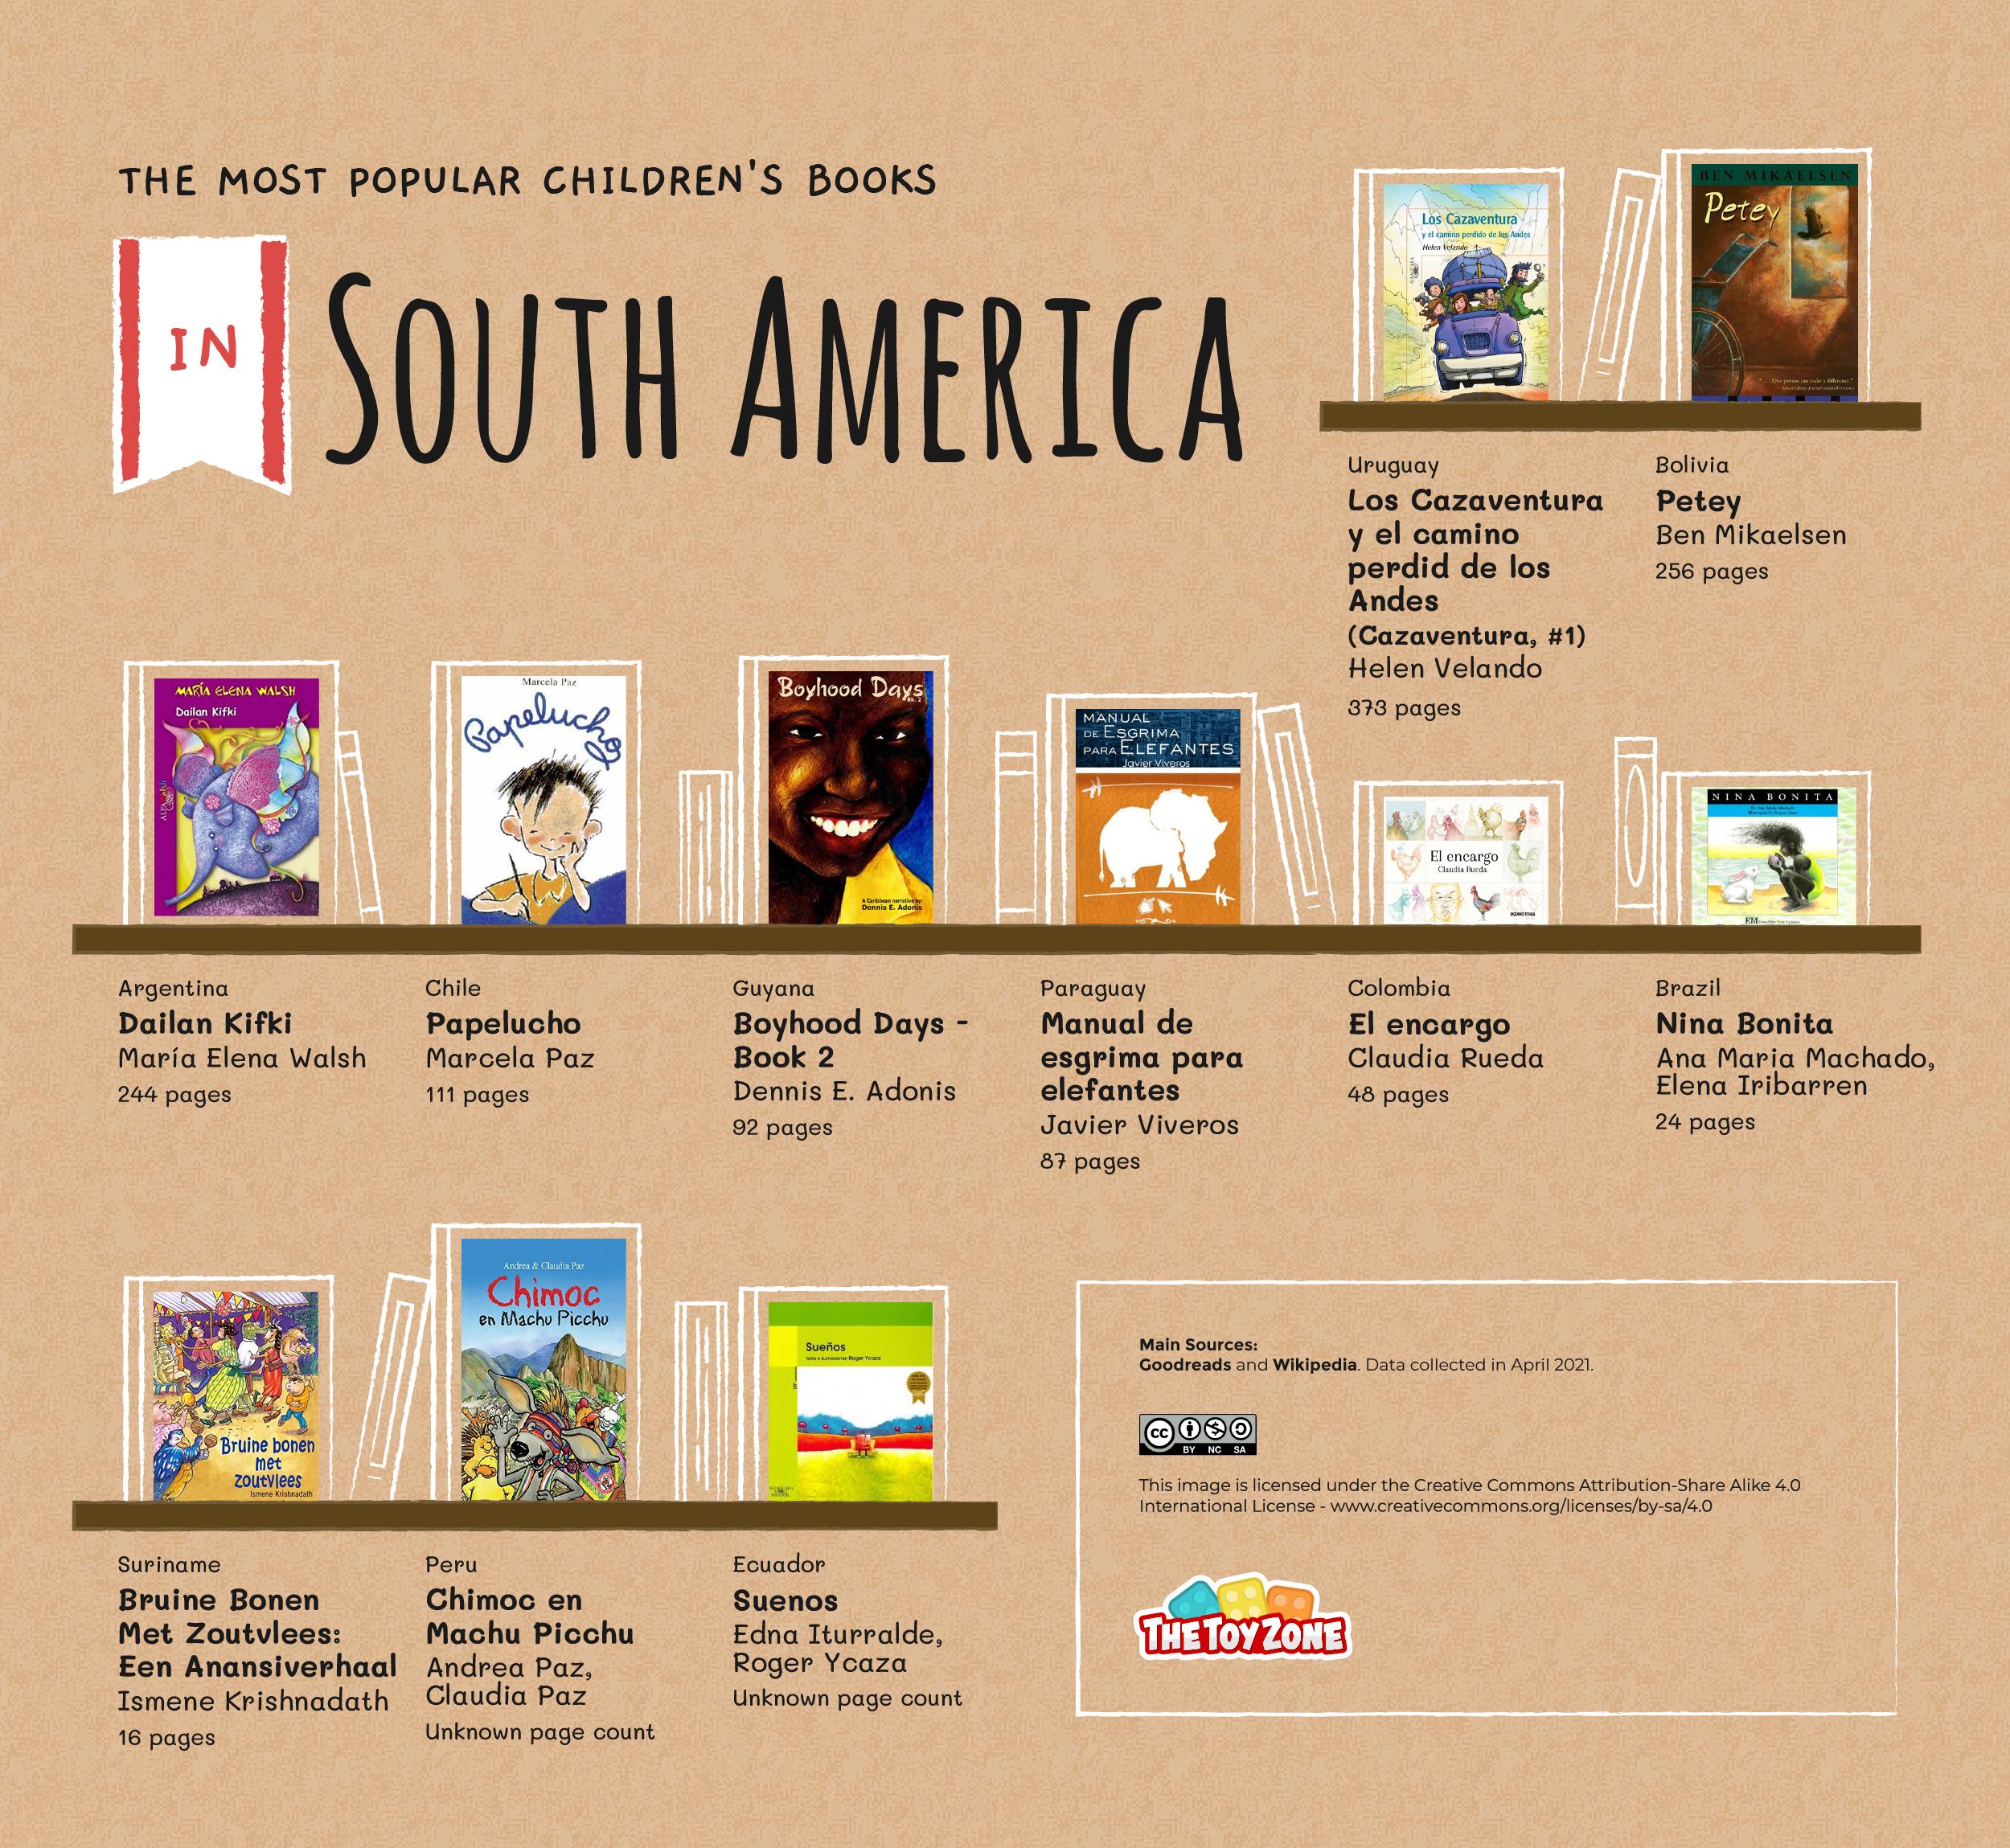 Most most popular children's books in South America bookshelf graphic